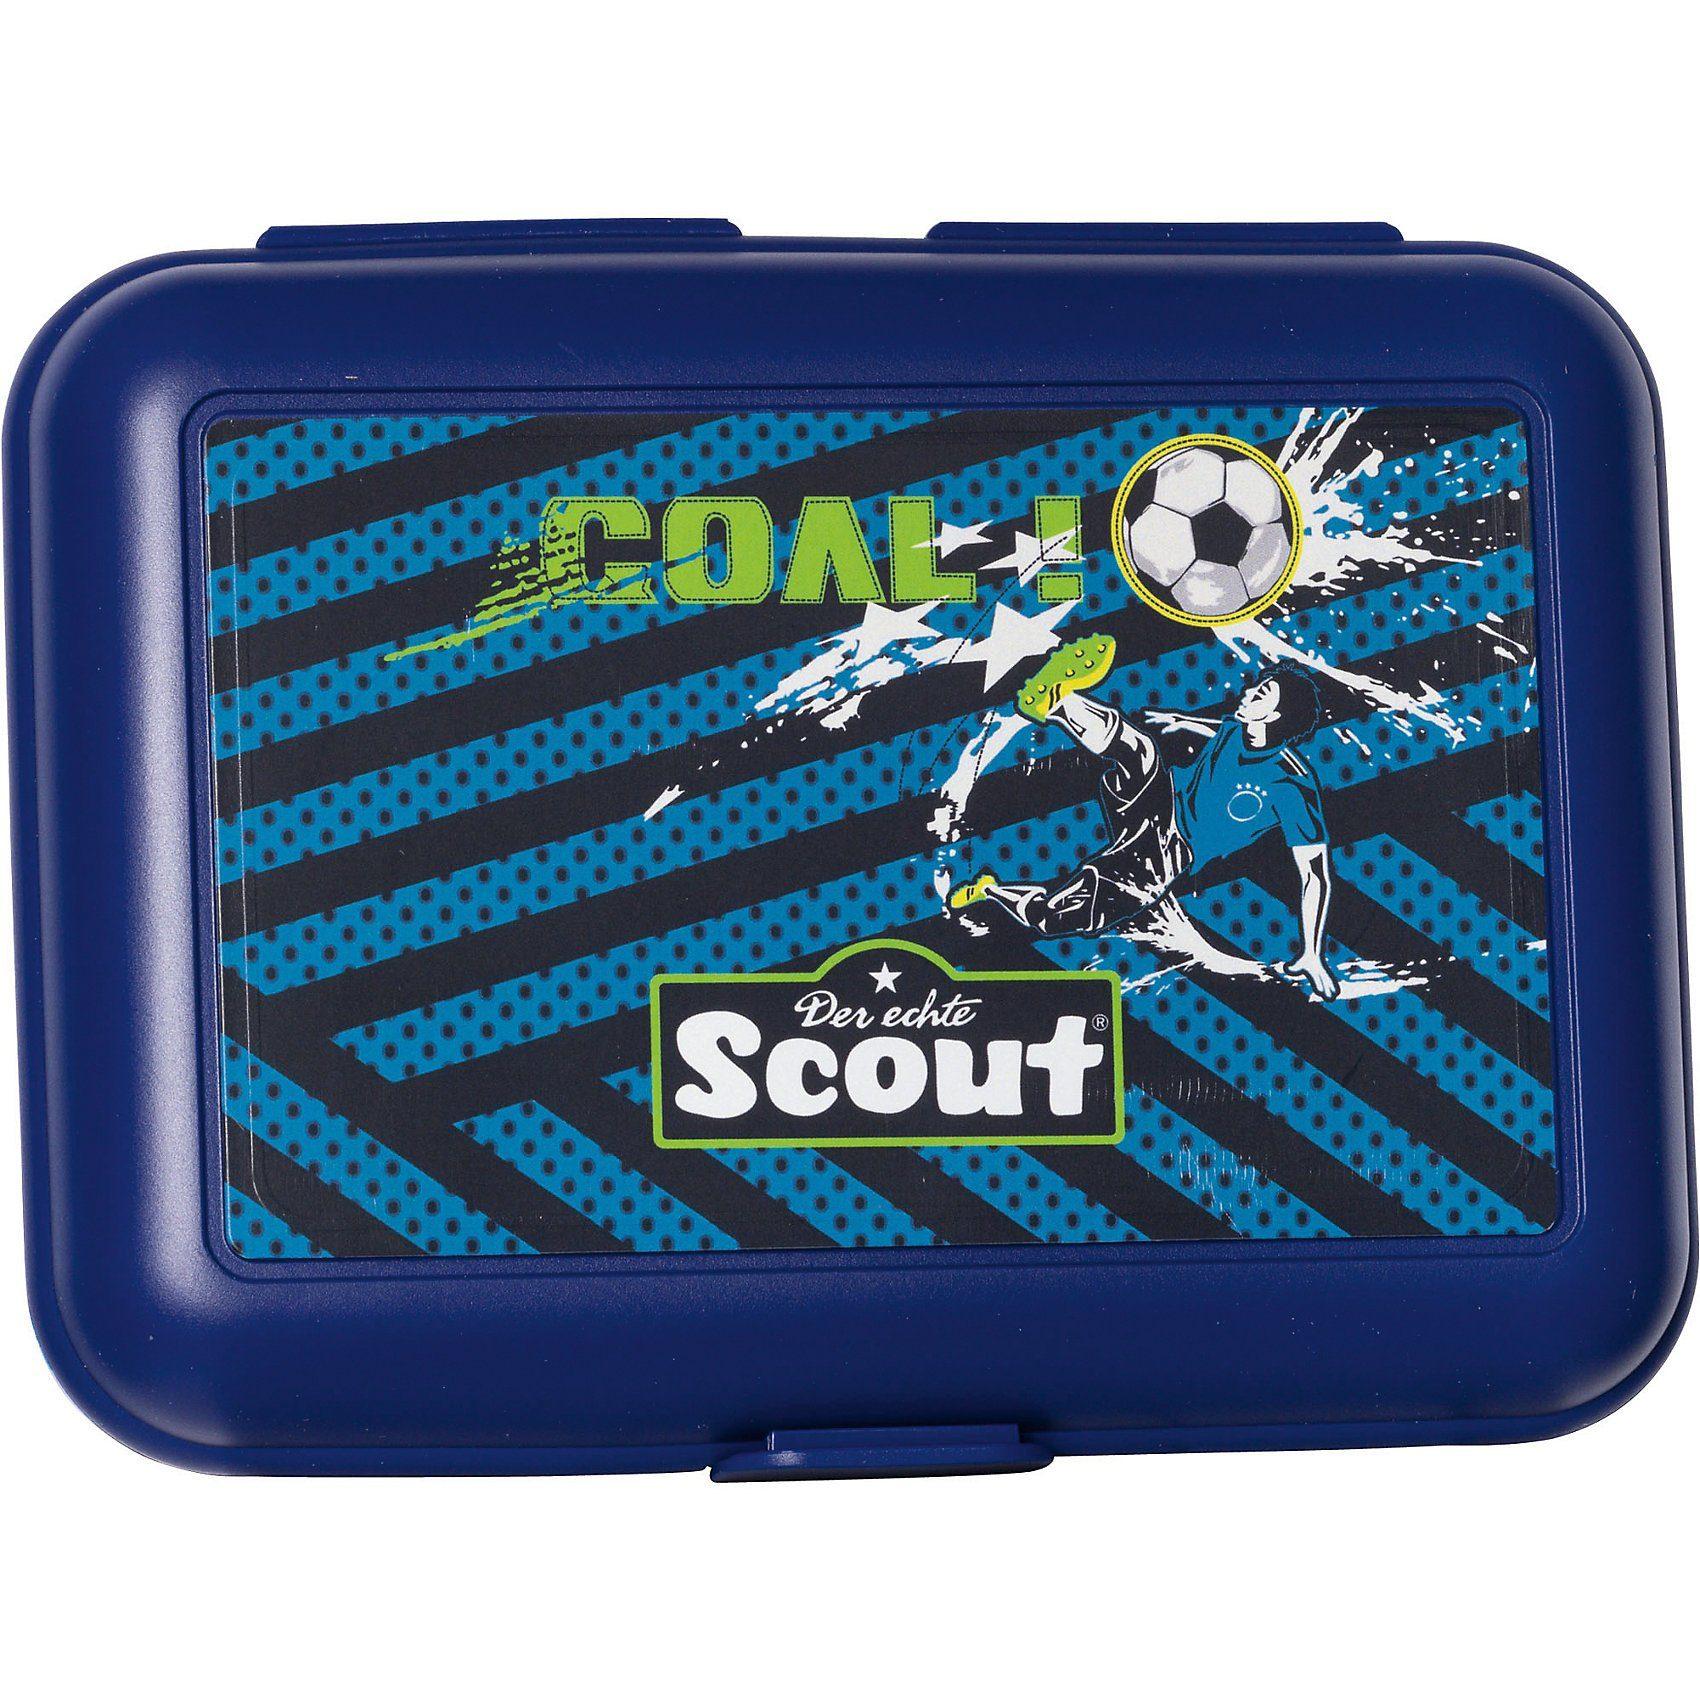 Scout Brotdose Goalgetter (Kollektion 2019)